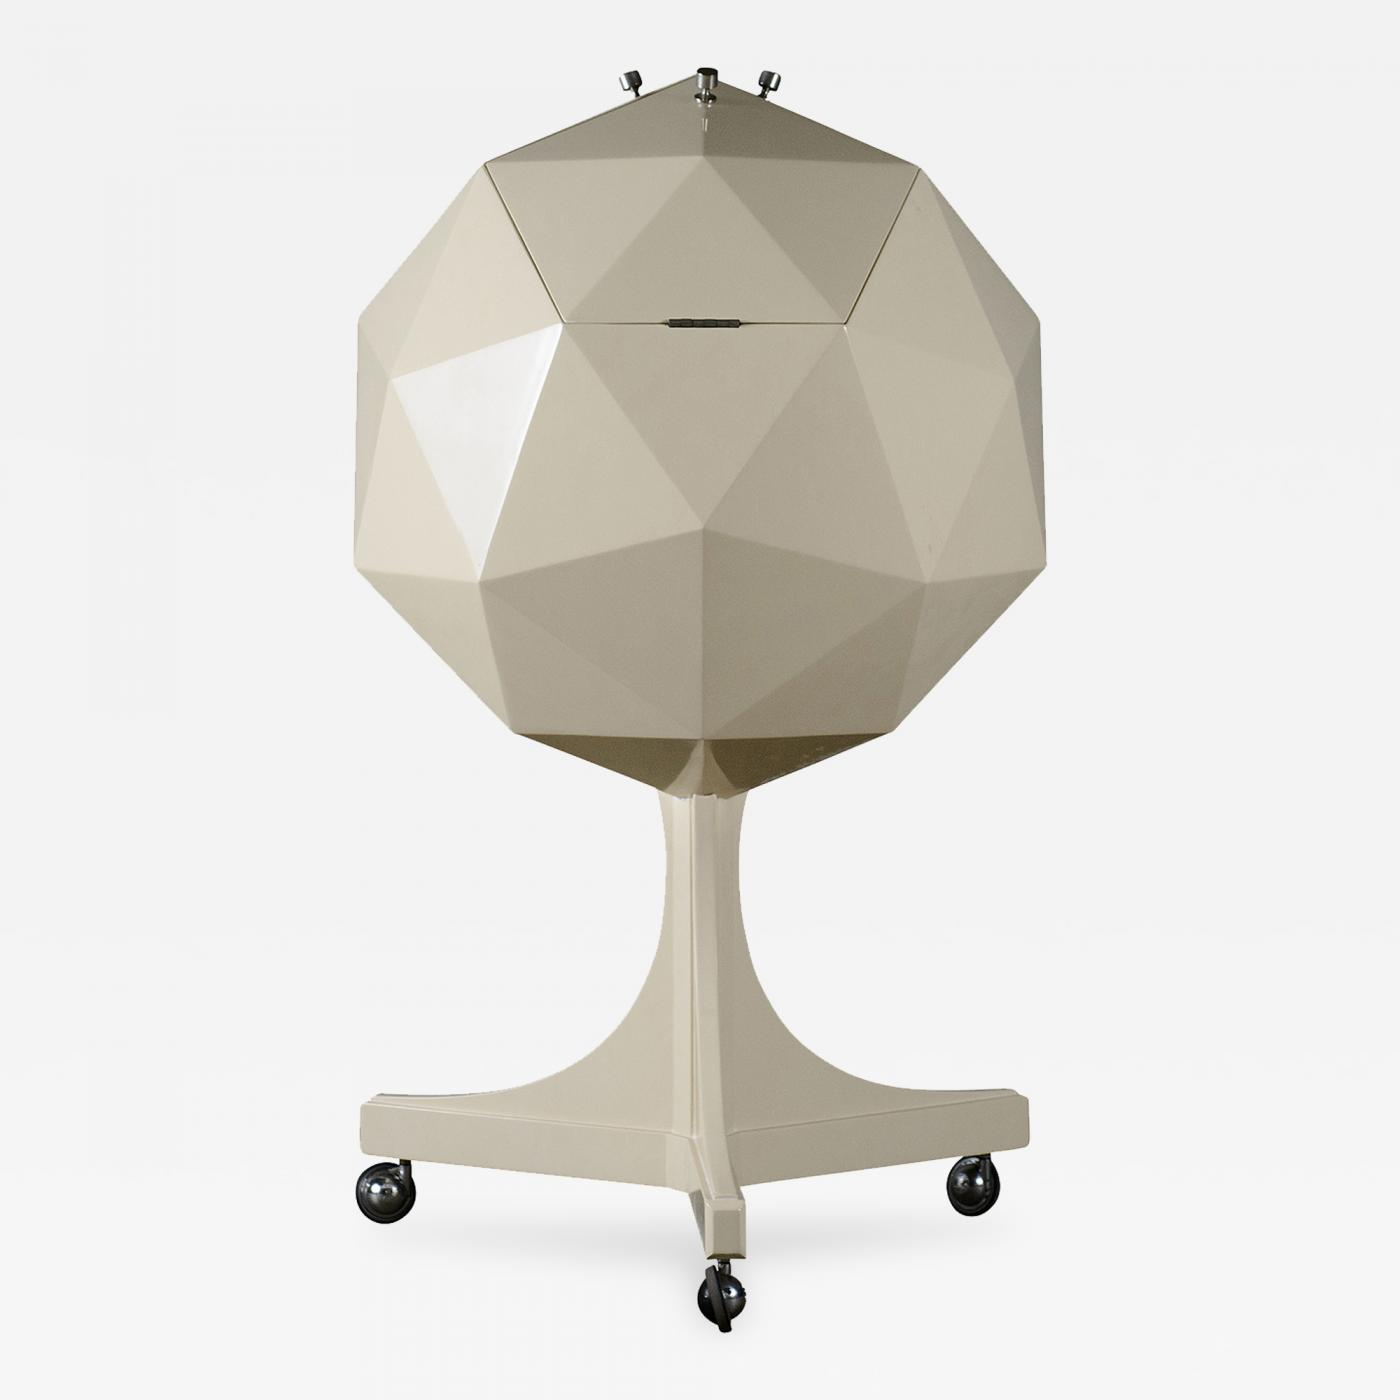 italian bar furniture. Listings / Furniture Case Pieces \u0026 Storage Cabinets · Ico Parisi Italian Bar